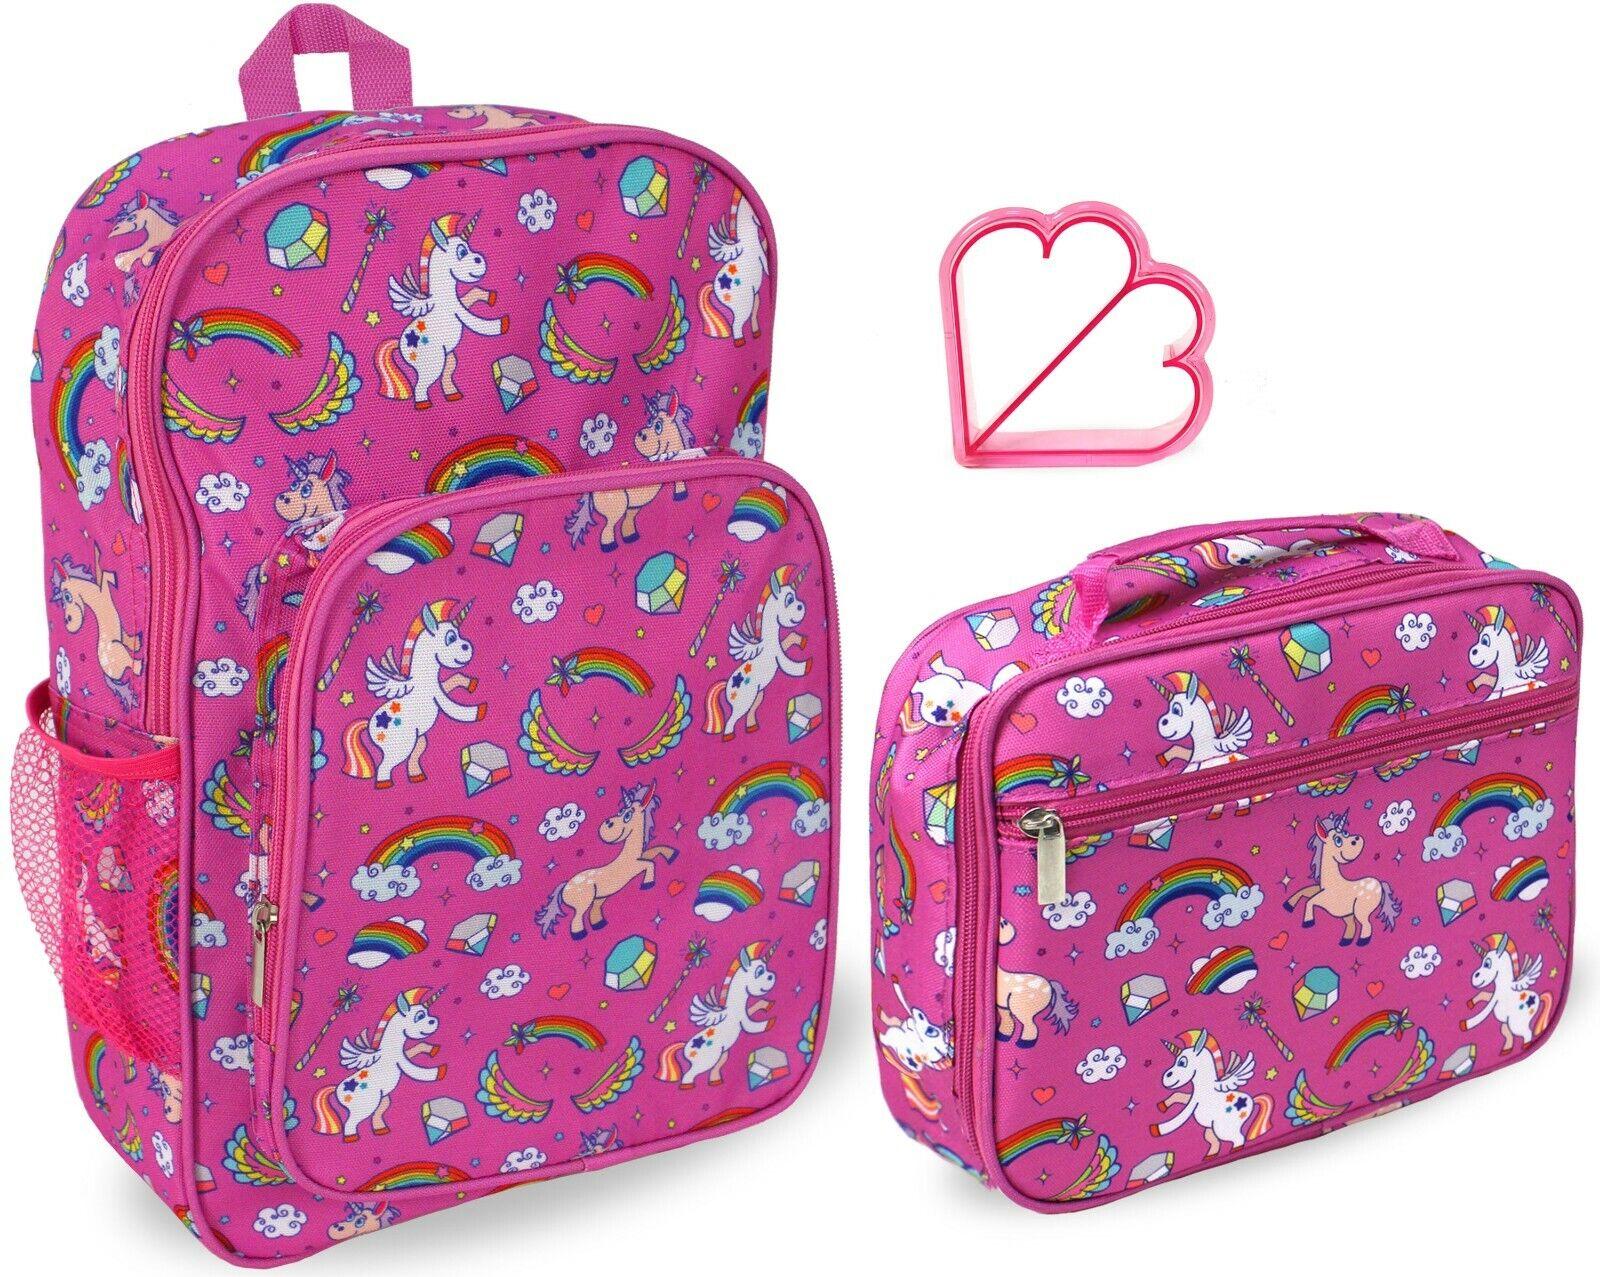 Keeli Kids Girls Lunch Box Backpack School Book Bag Set in U